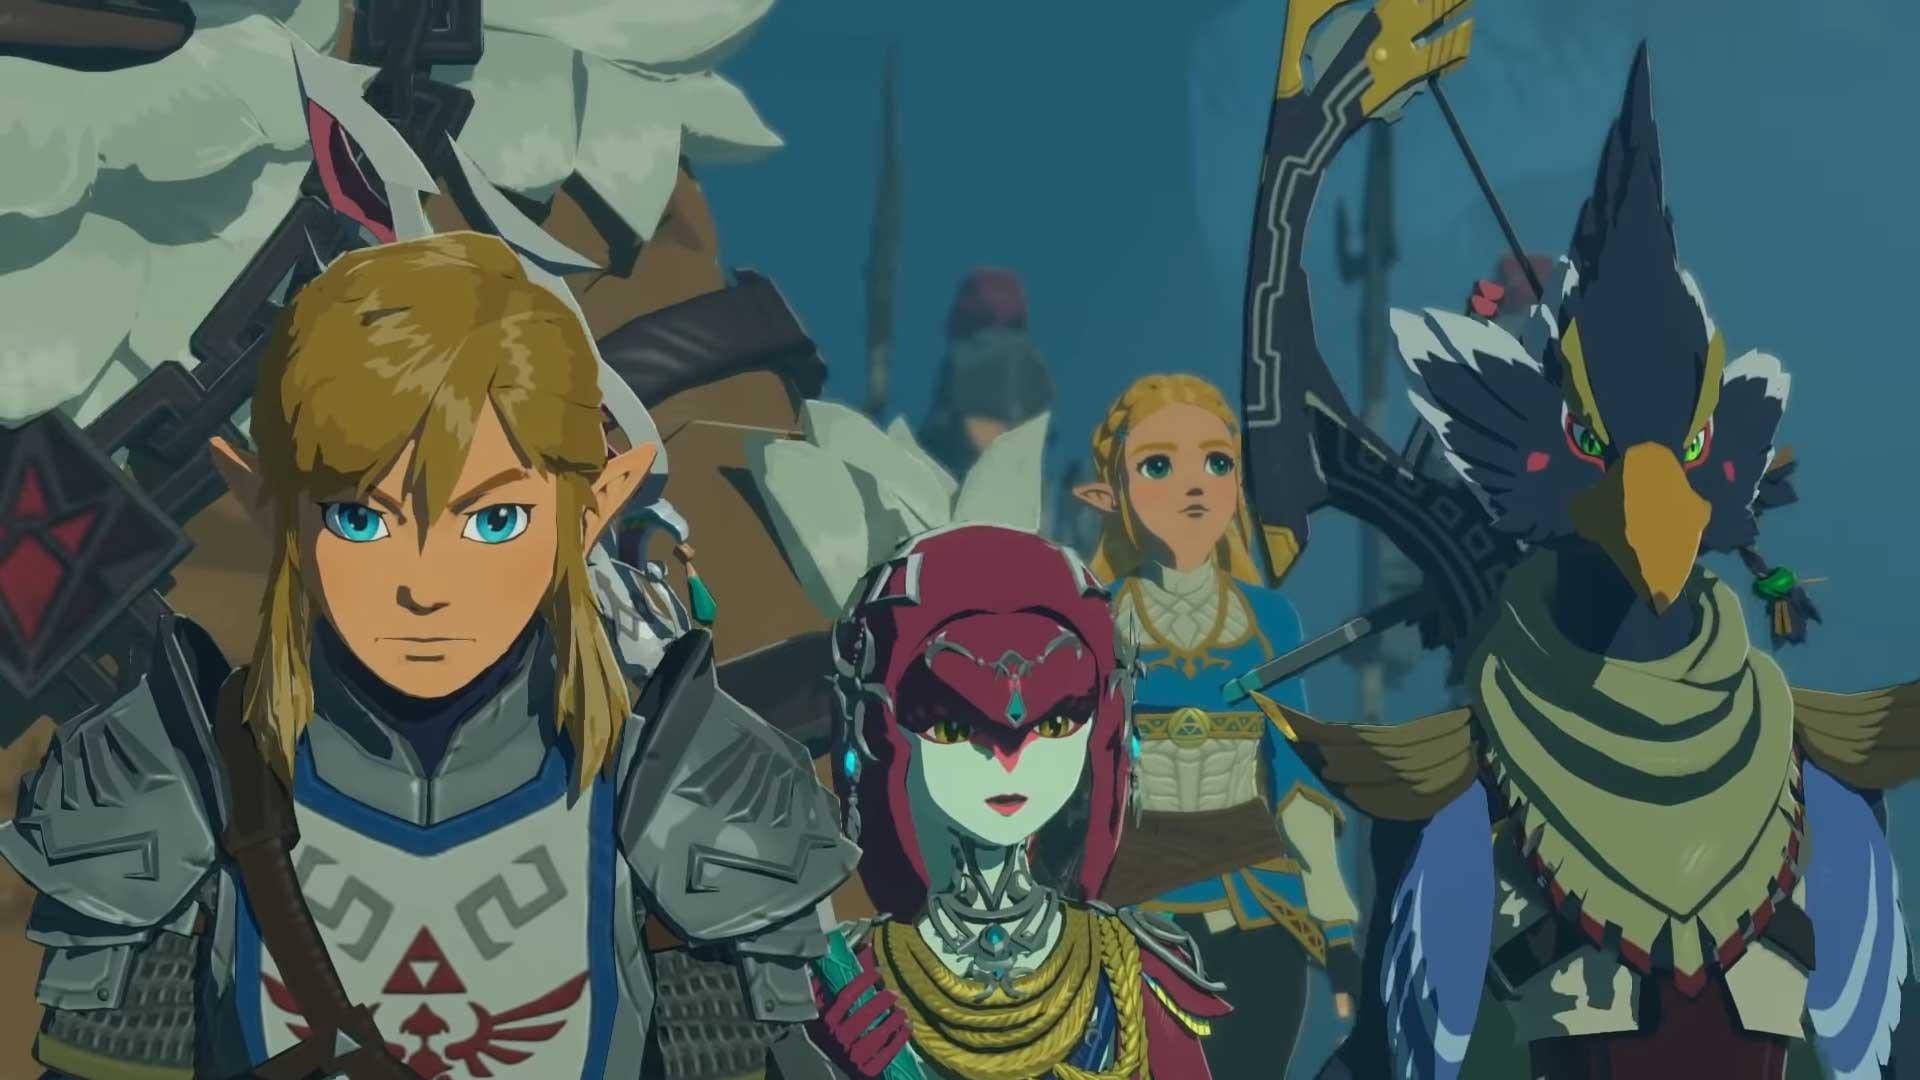 hyrule warriors zdv screenshot 3